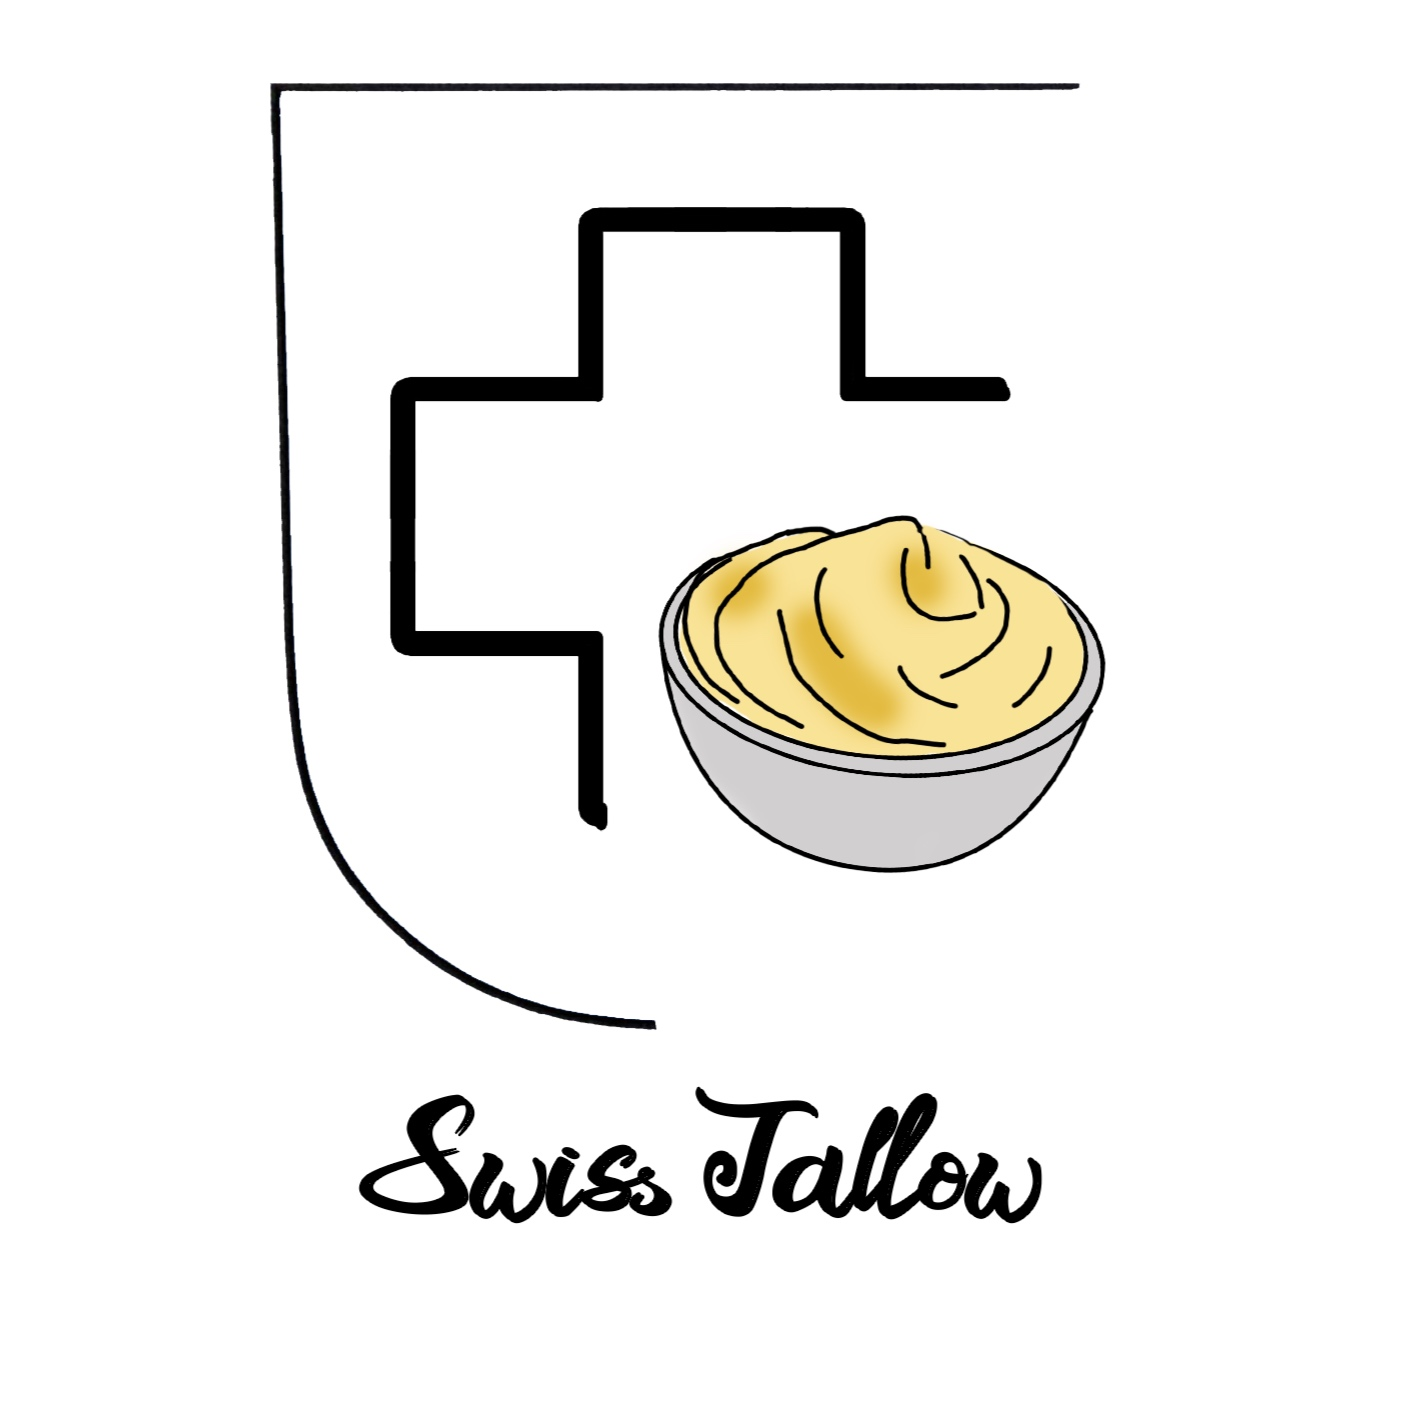 swiss tallow.png